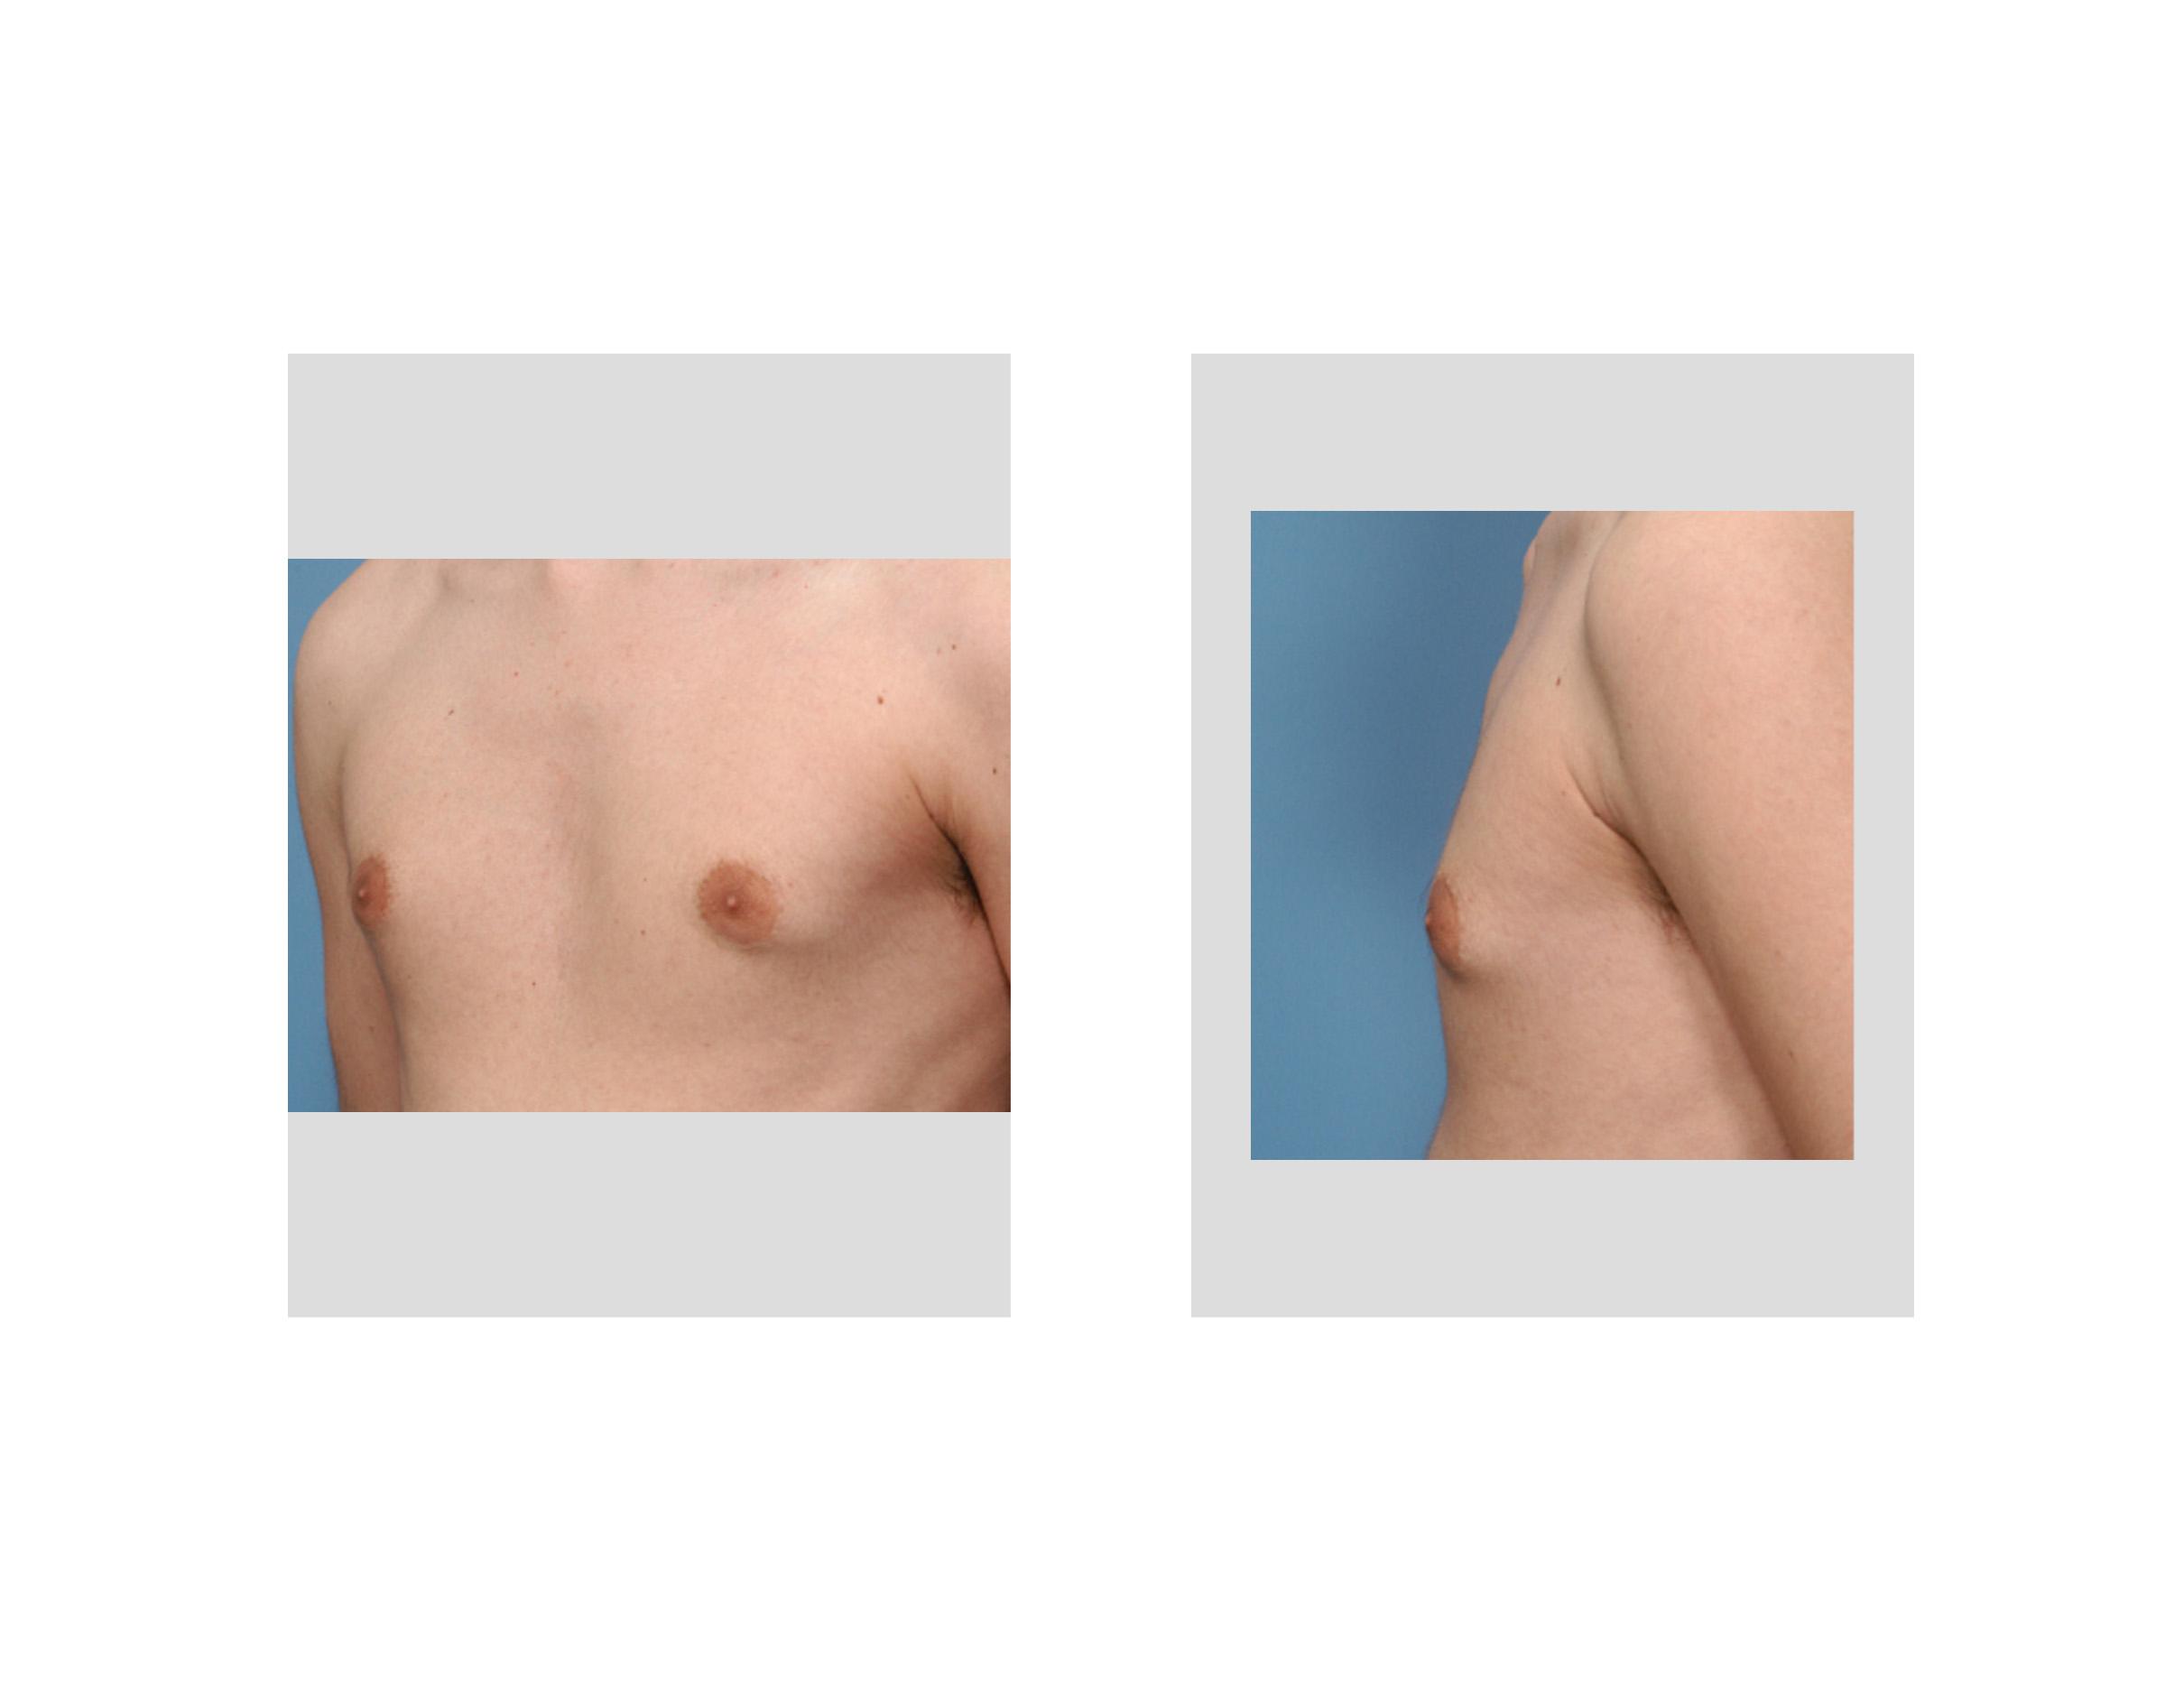 puffy nipples